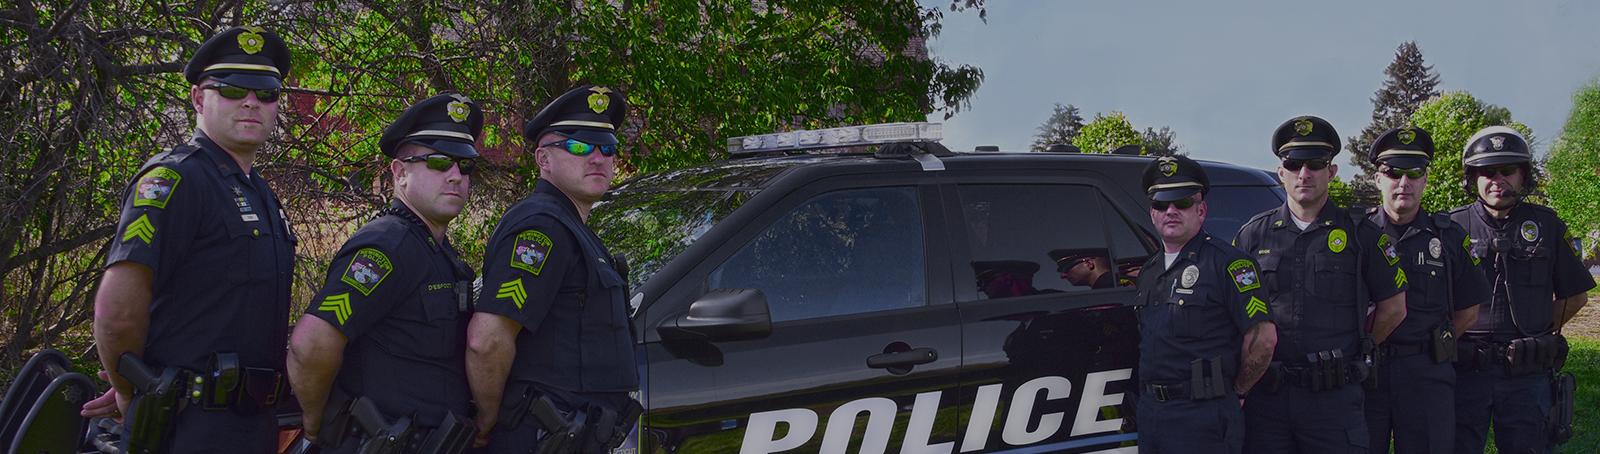 Emergency Response Team History   Newington, CT